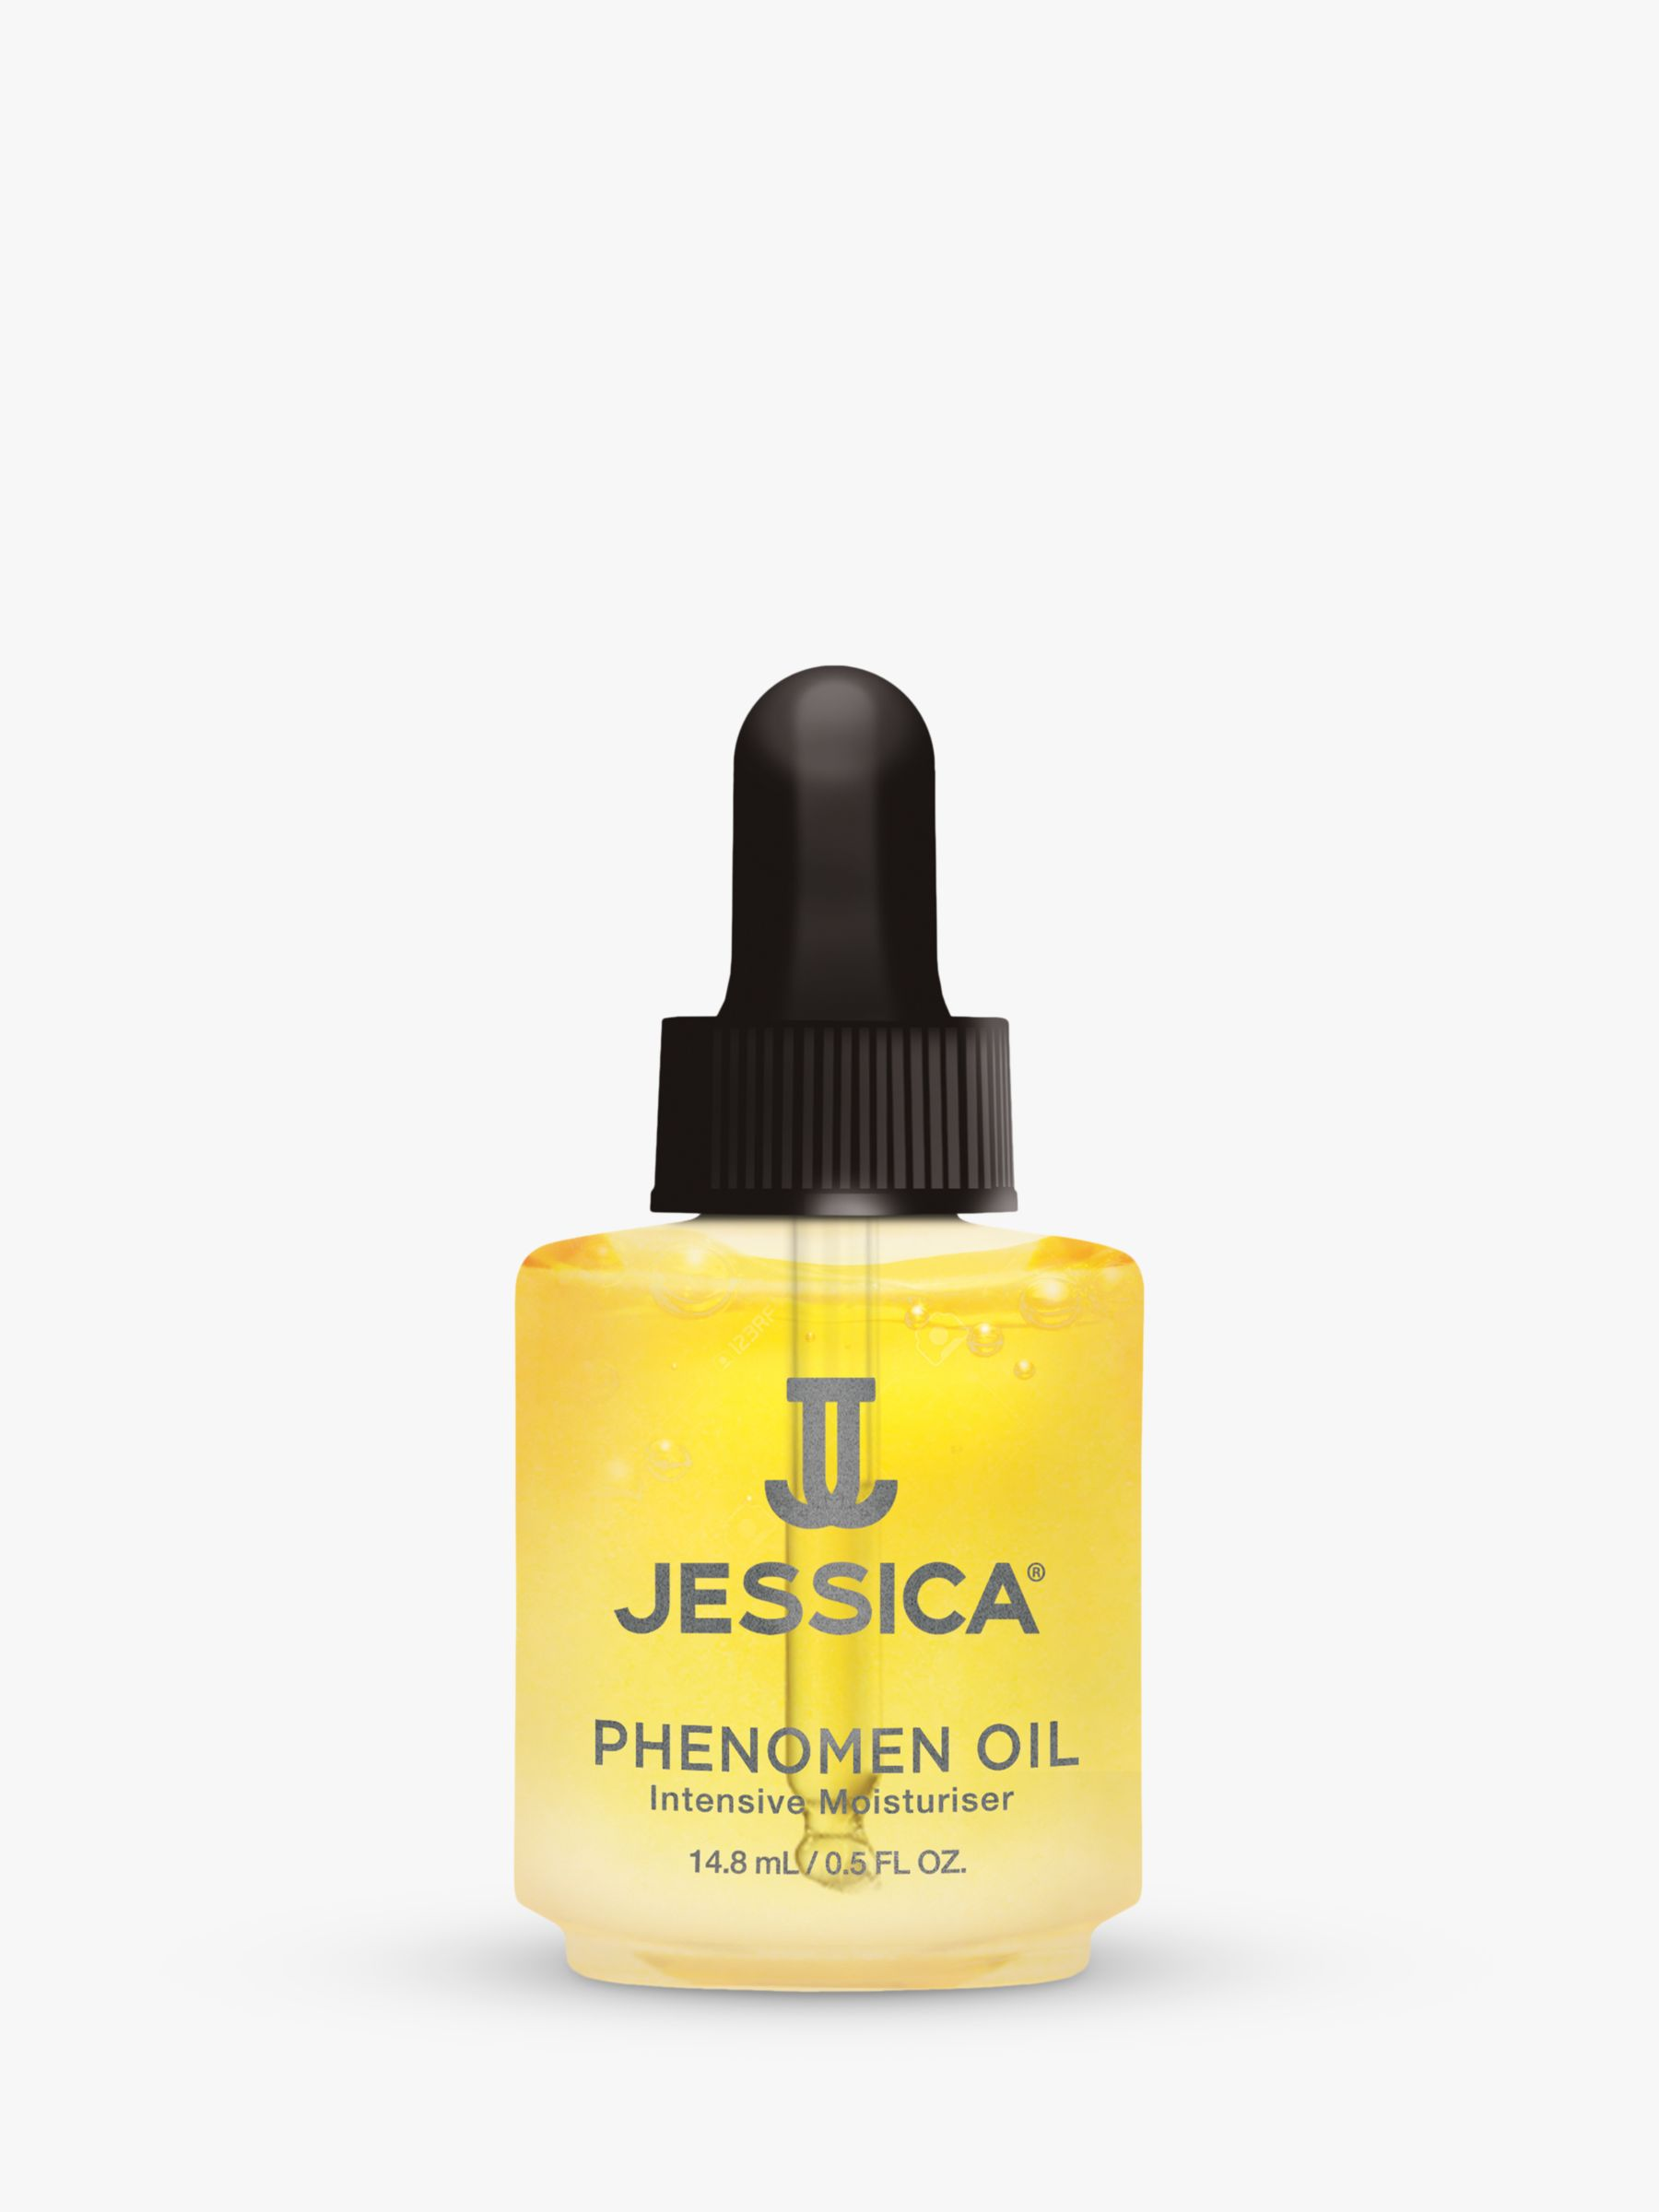 Jessica Jessica Phenomen Oil Intensive Moisturiser